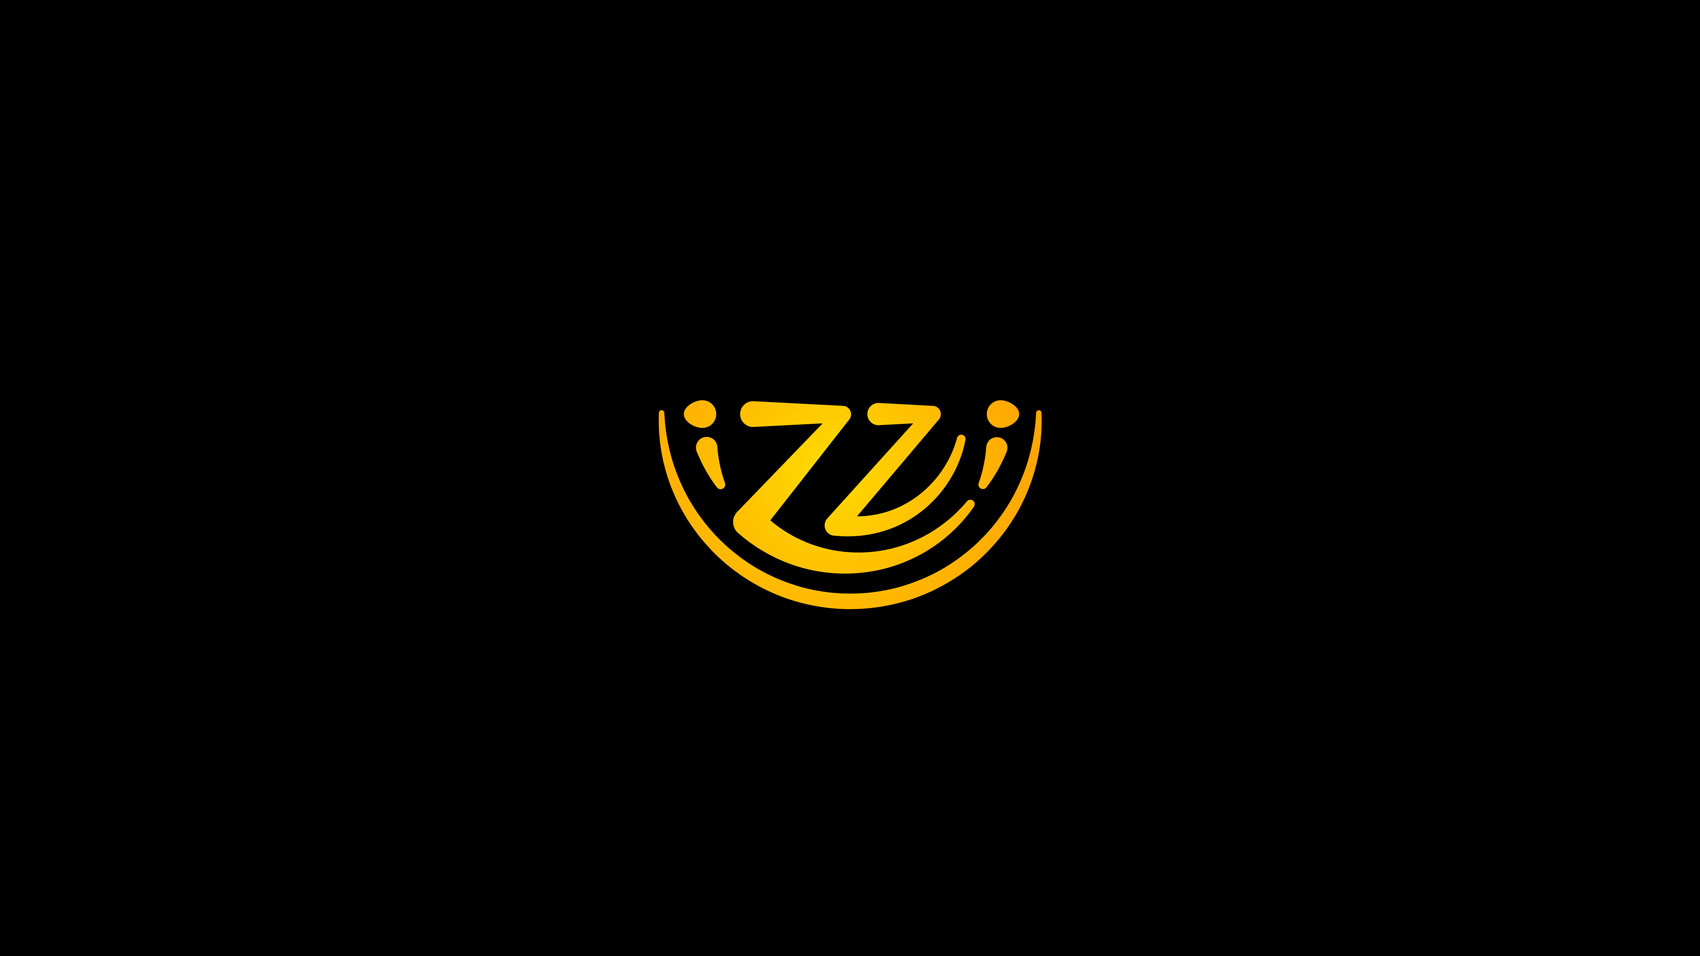 izzi logo design